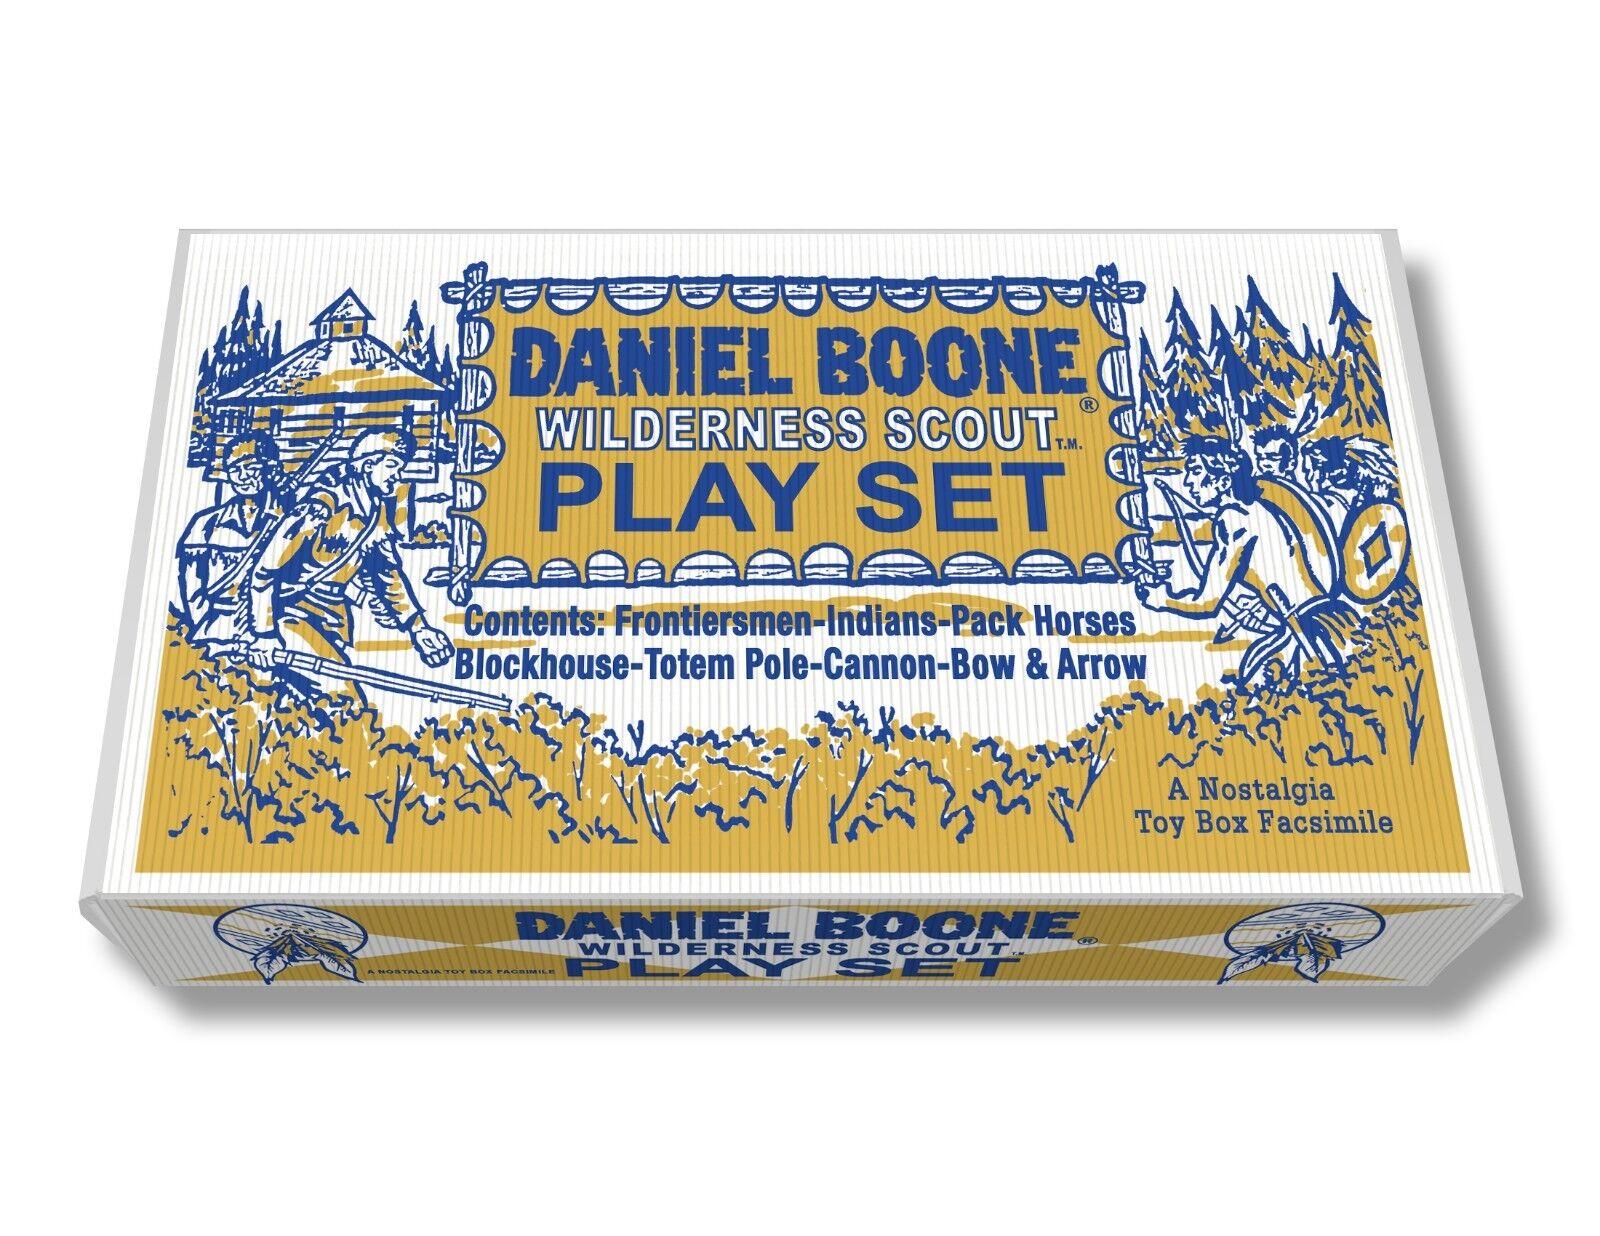 Marx Daniel Boone Wilderness Scout Play Set Box    No. 2640